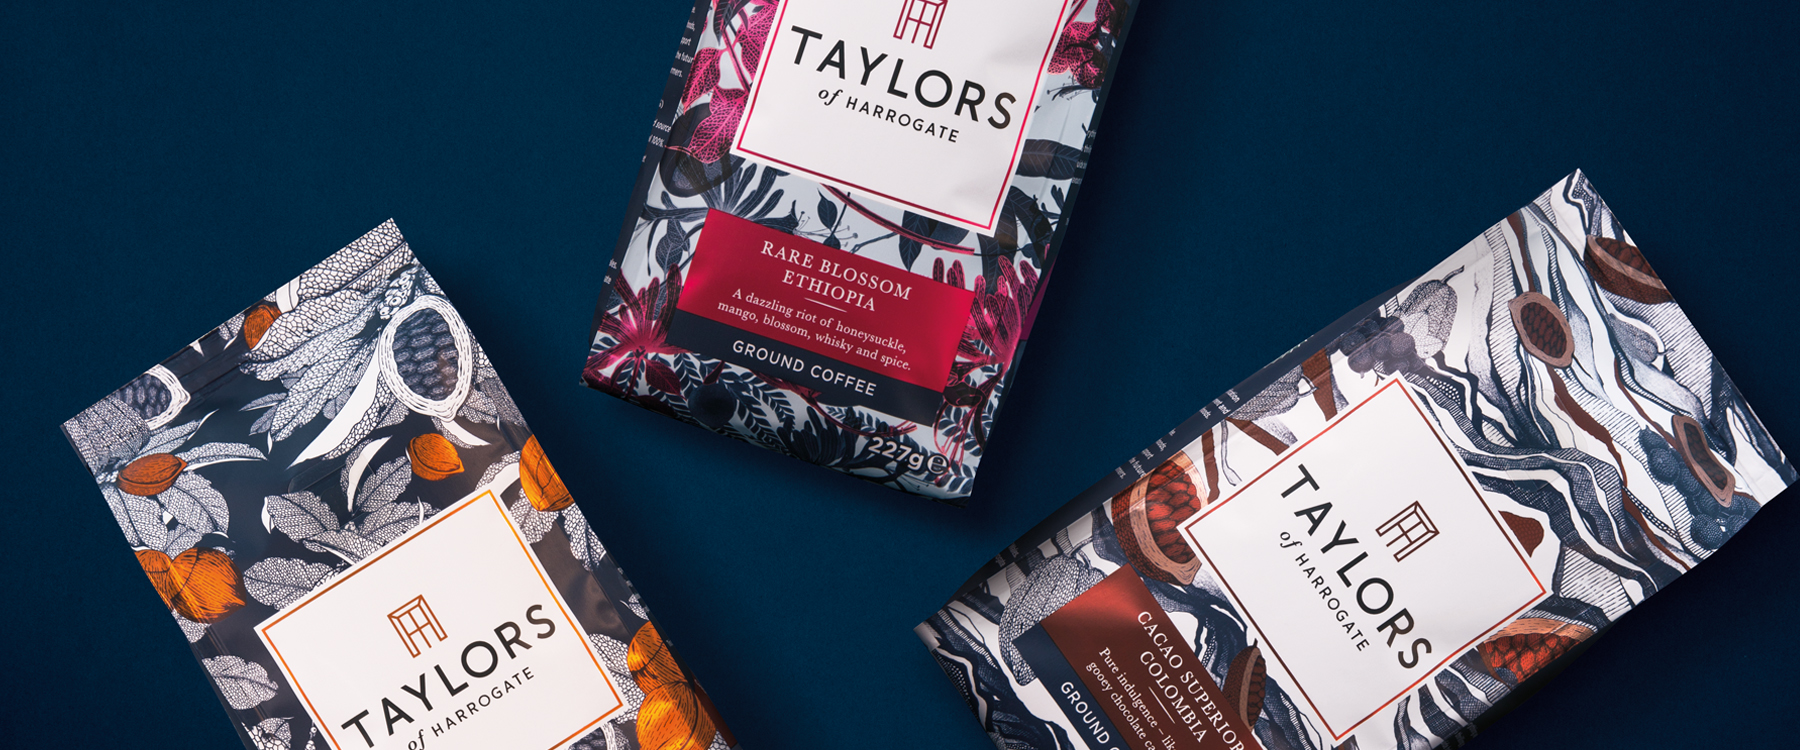 Hero-Taylors-Ground-Coffee-Scattered.jpg